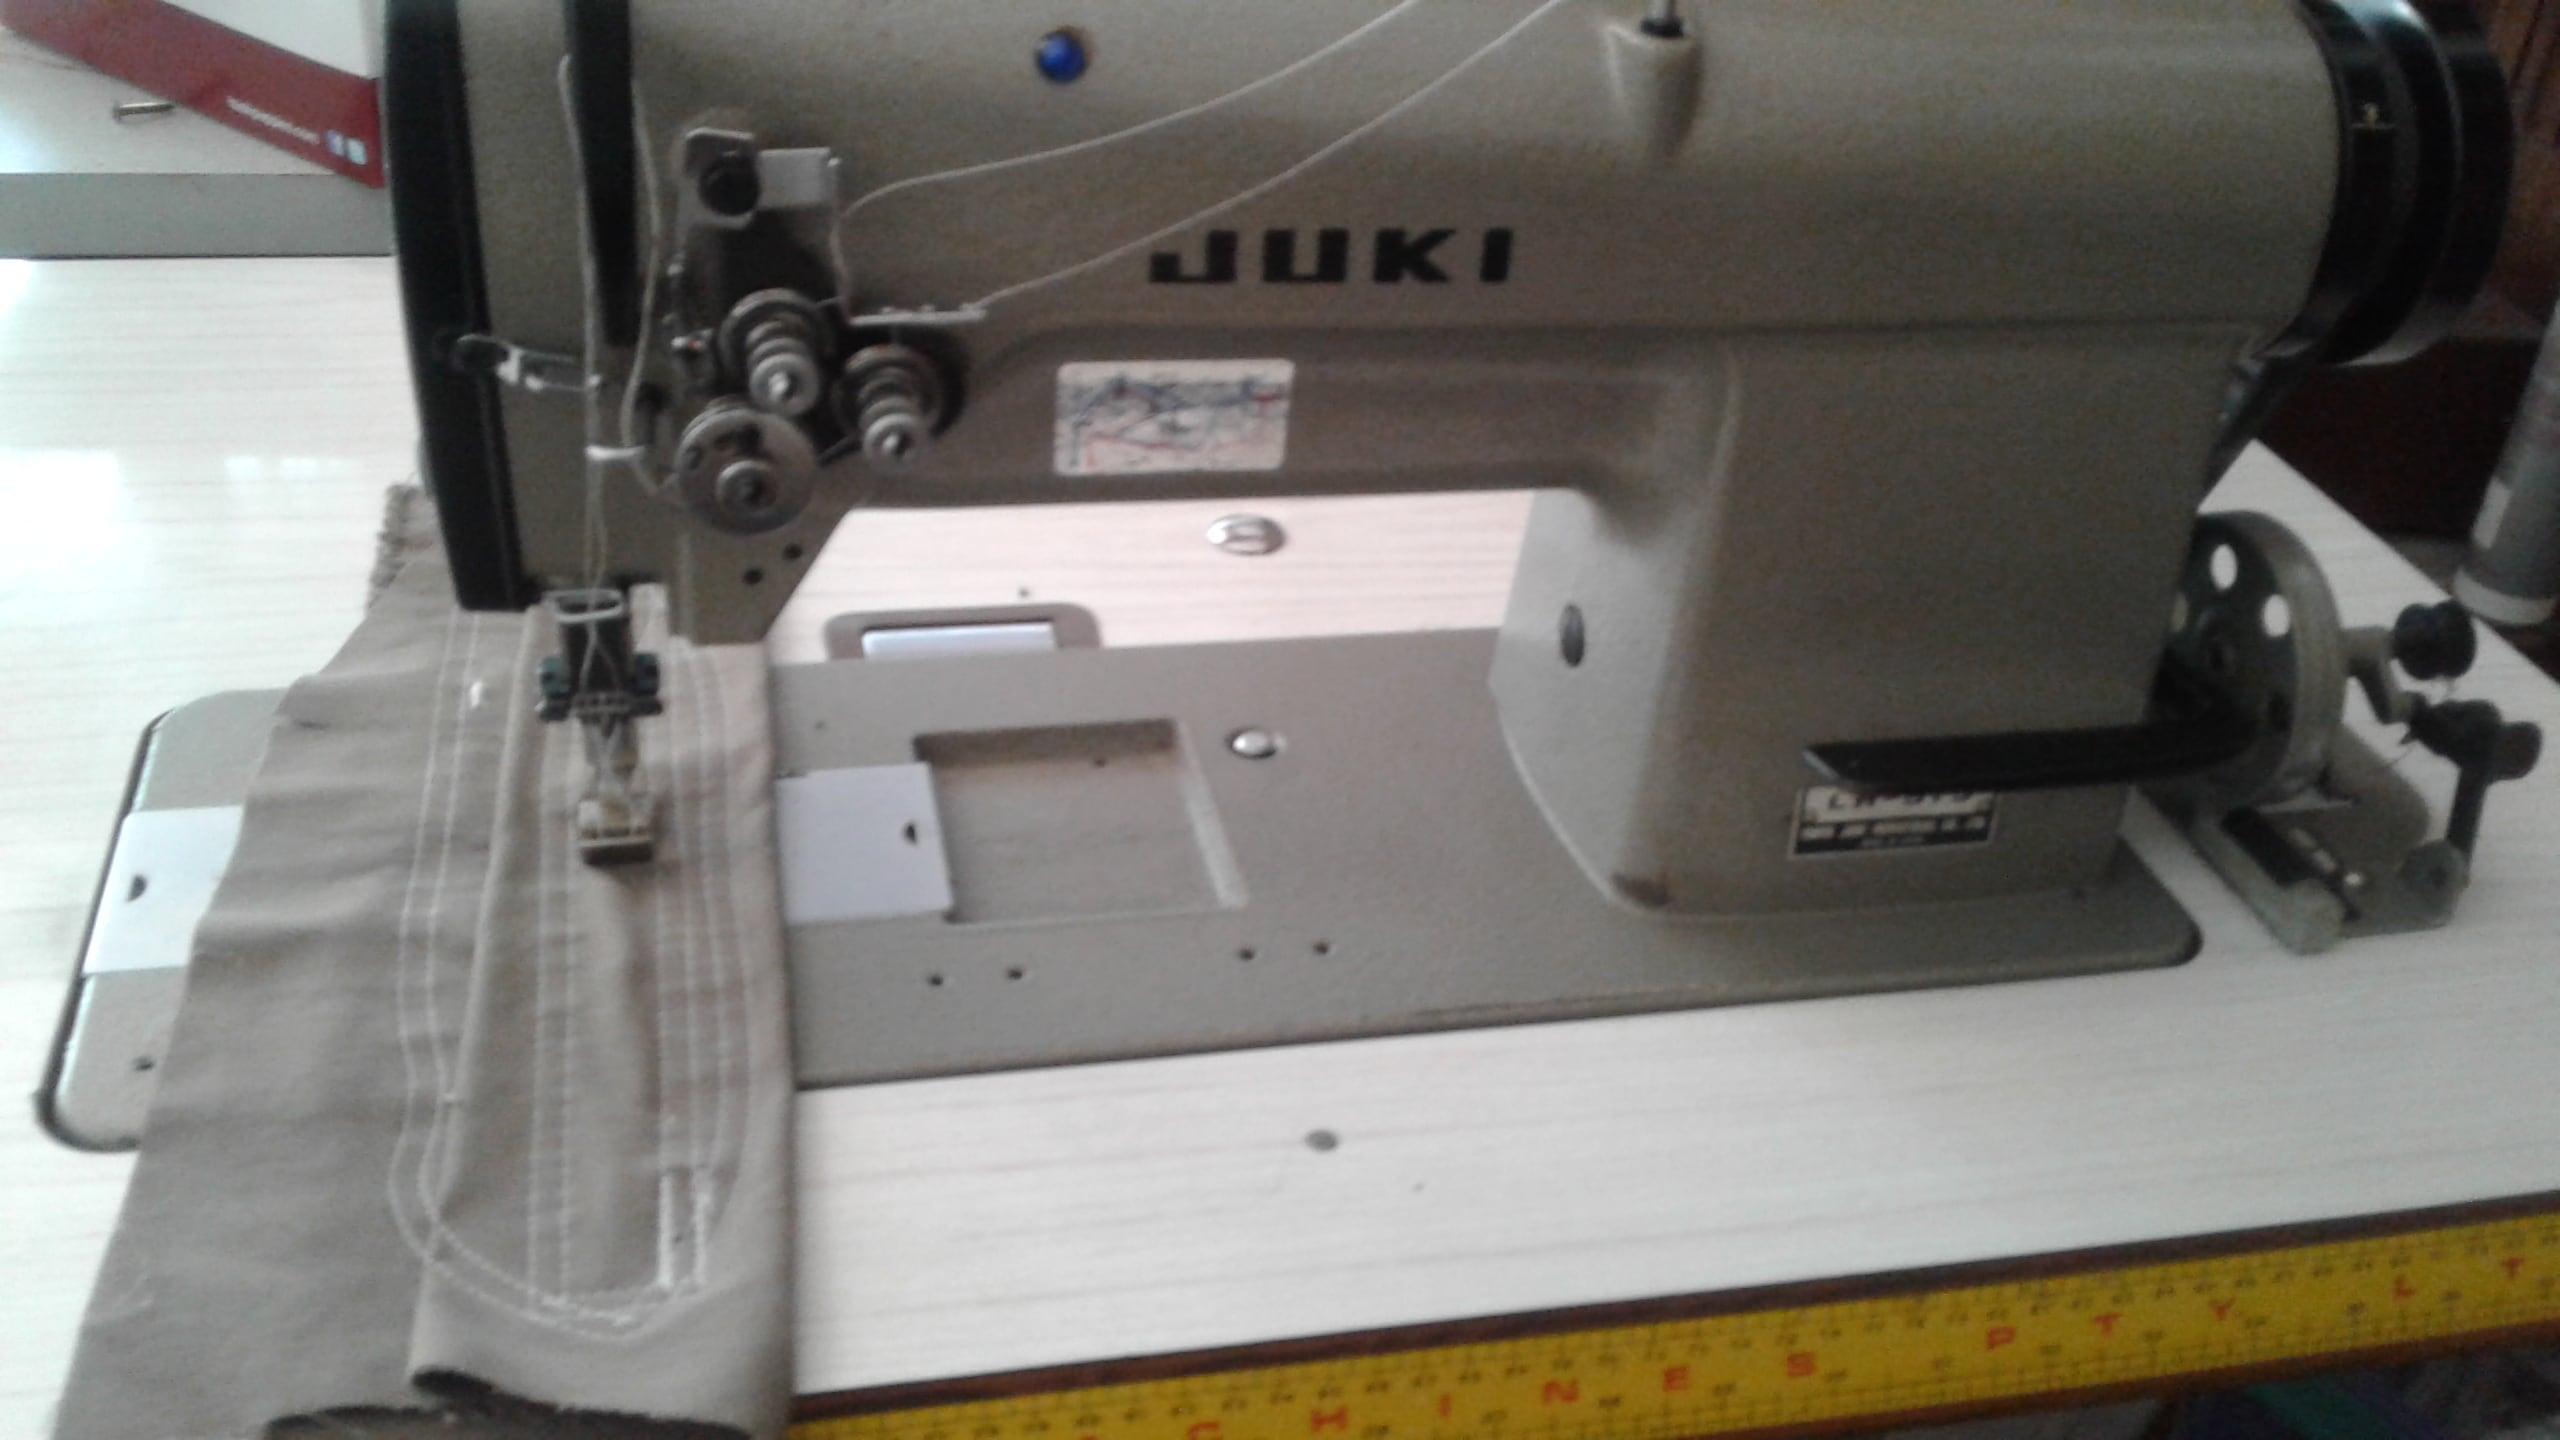 Industrial sewing machines: classes, purpose, maintenance 83